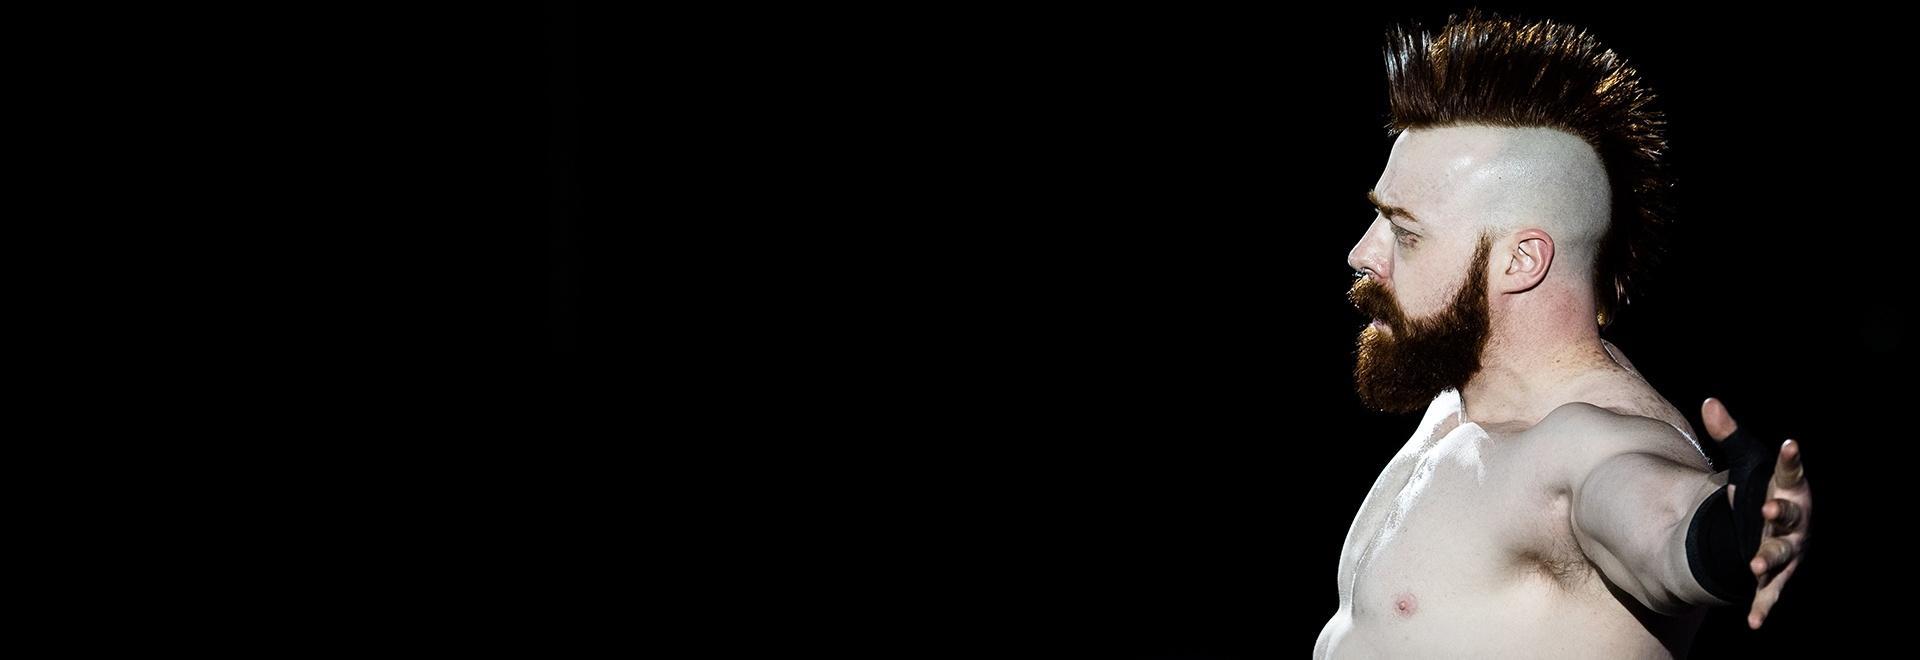 Ep. 233